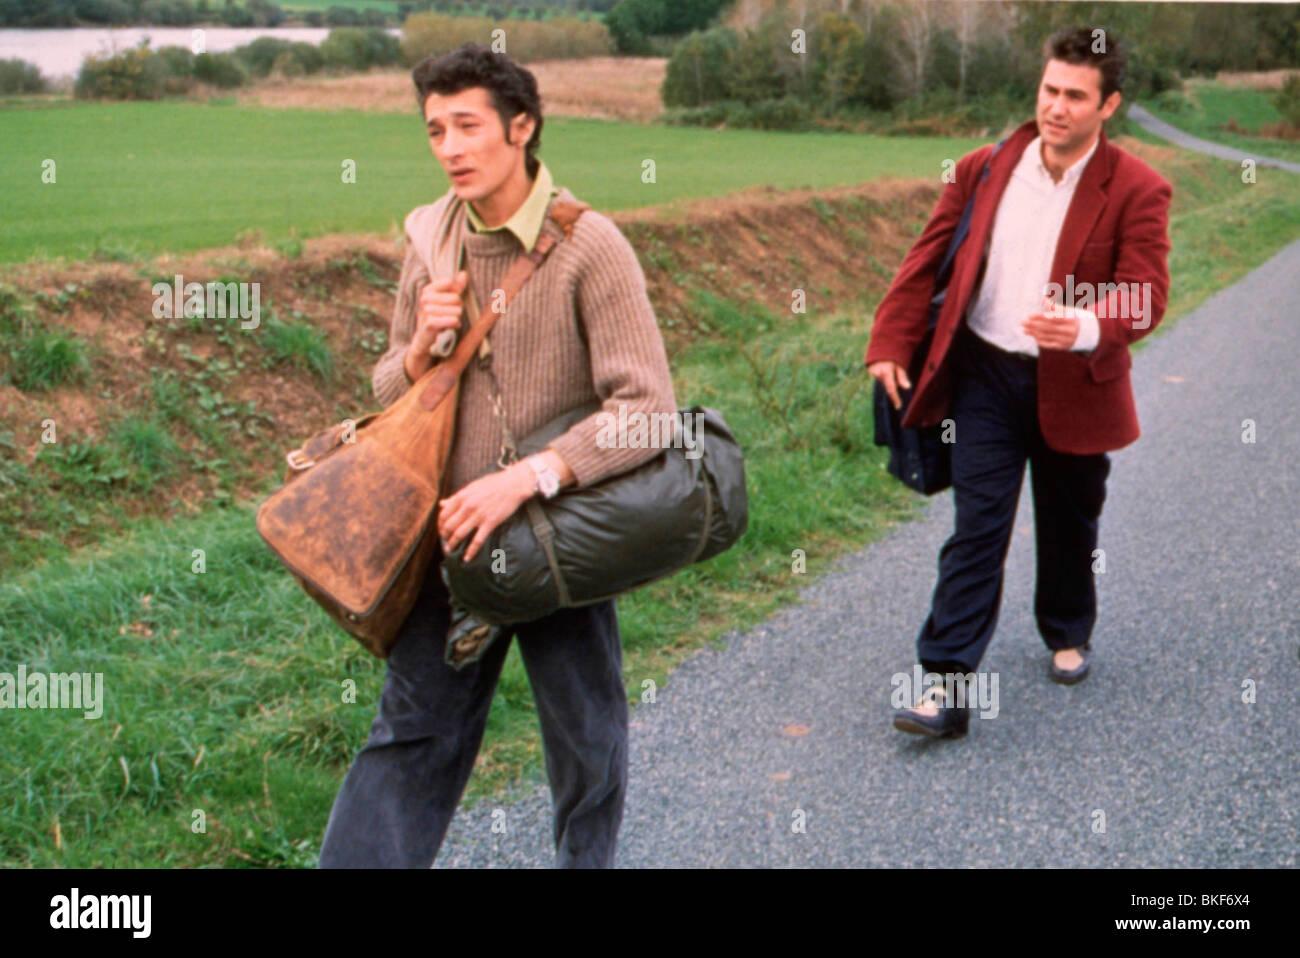 WESTERN (1997) SACHA BOURDO, SERGI LOPEZ WSTN 001 - Stock Image